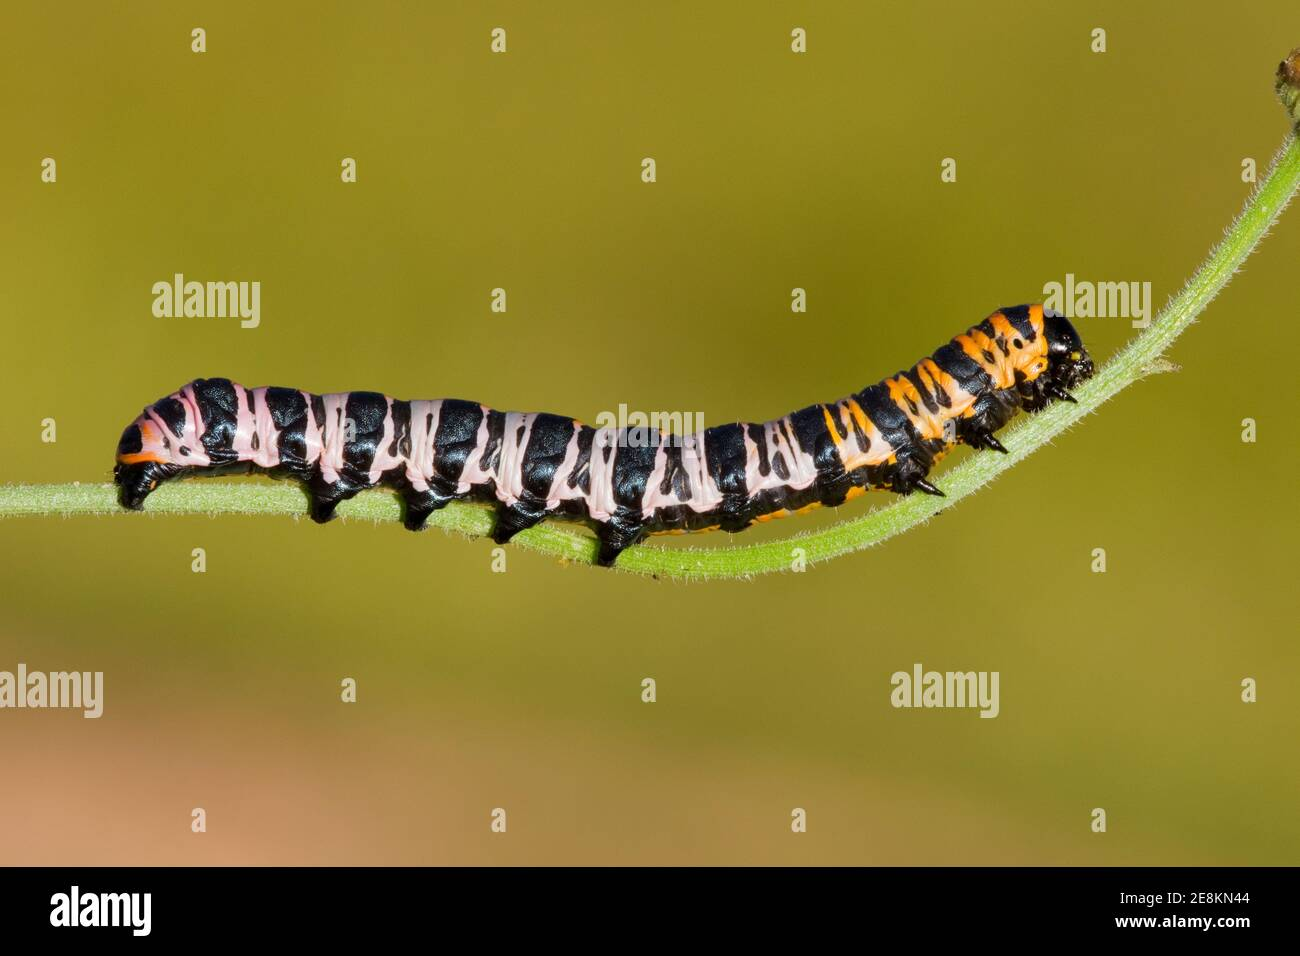 Noctuid Moth larva, Cucullia lilacina, Noctuidae. Length 38 mm. Feeding on fleabane, Erigeron sp. Previous larva images 14080973-14080982 on 8-23-14. Stock Photo